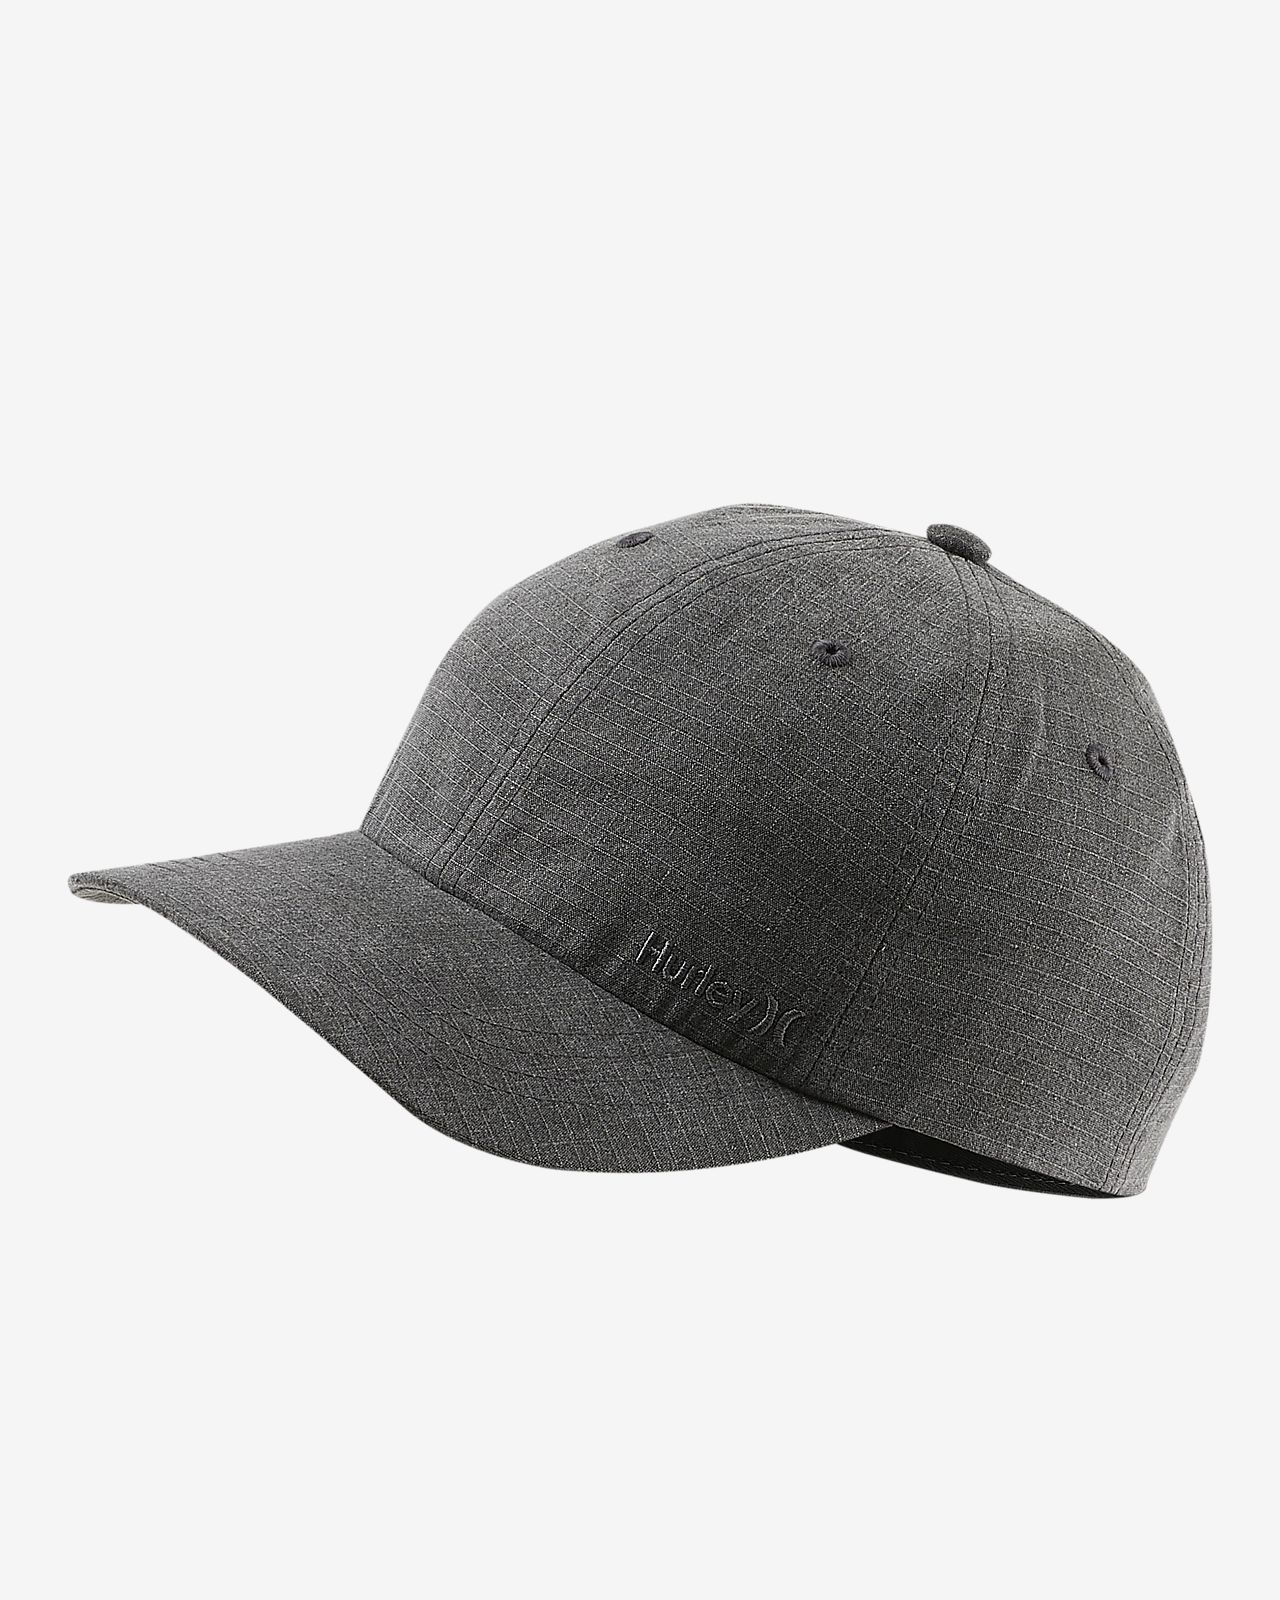 Cappello Hurley Andy Ripstop - Uomo